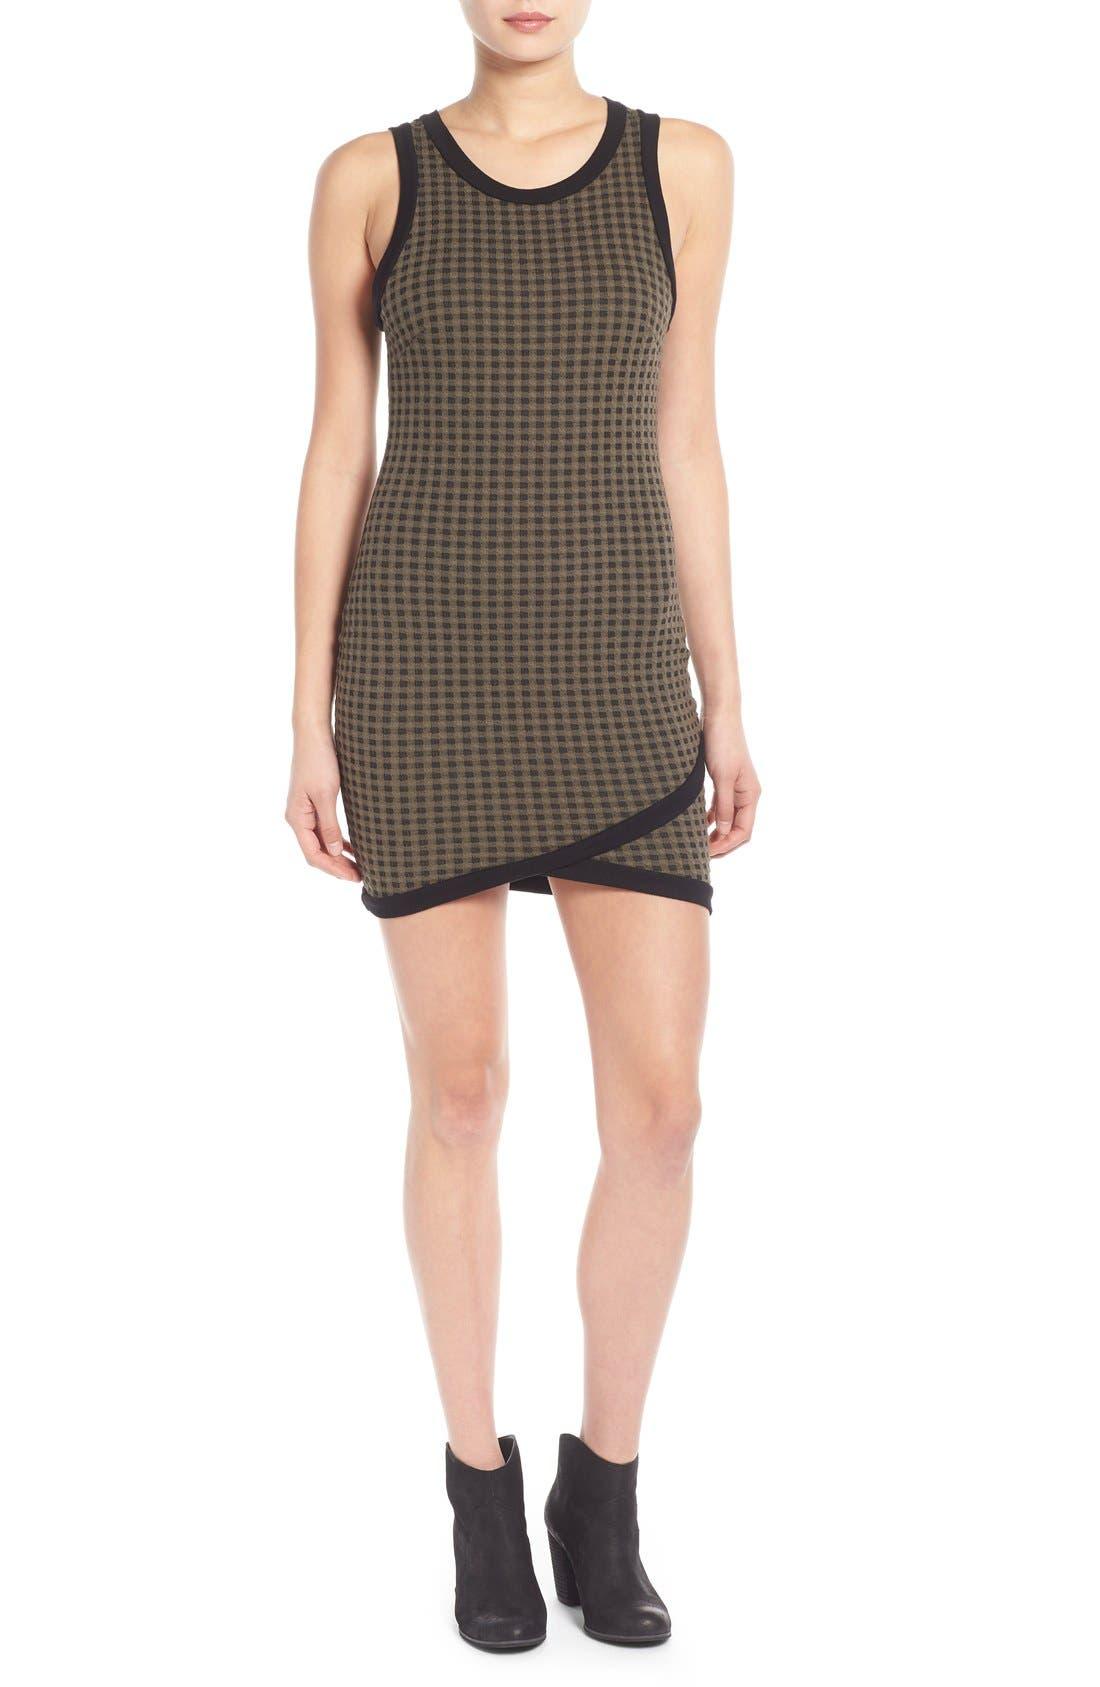 Alternate Image 1 Selected - Lush Surplice Hem Knit Body-Con Dress